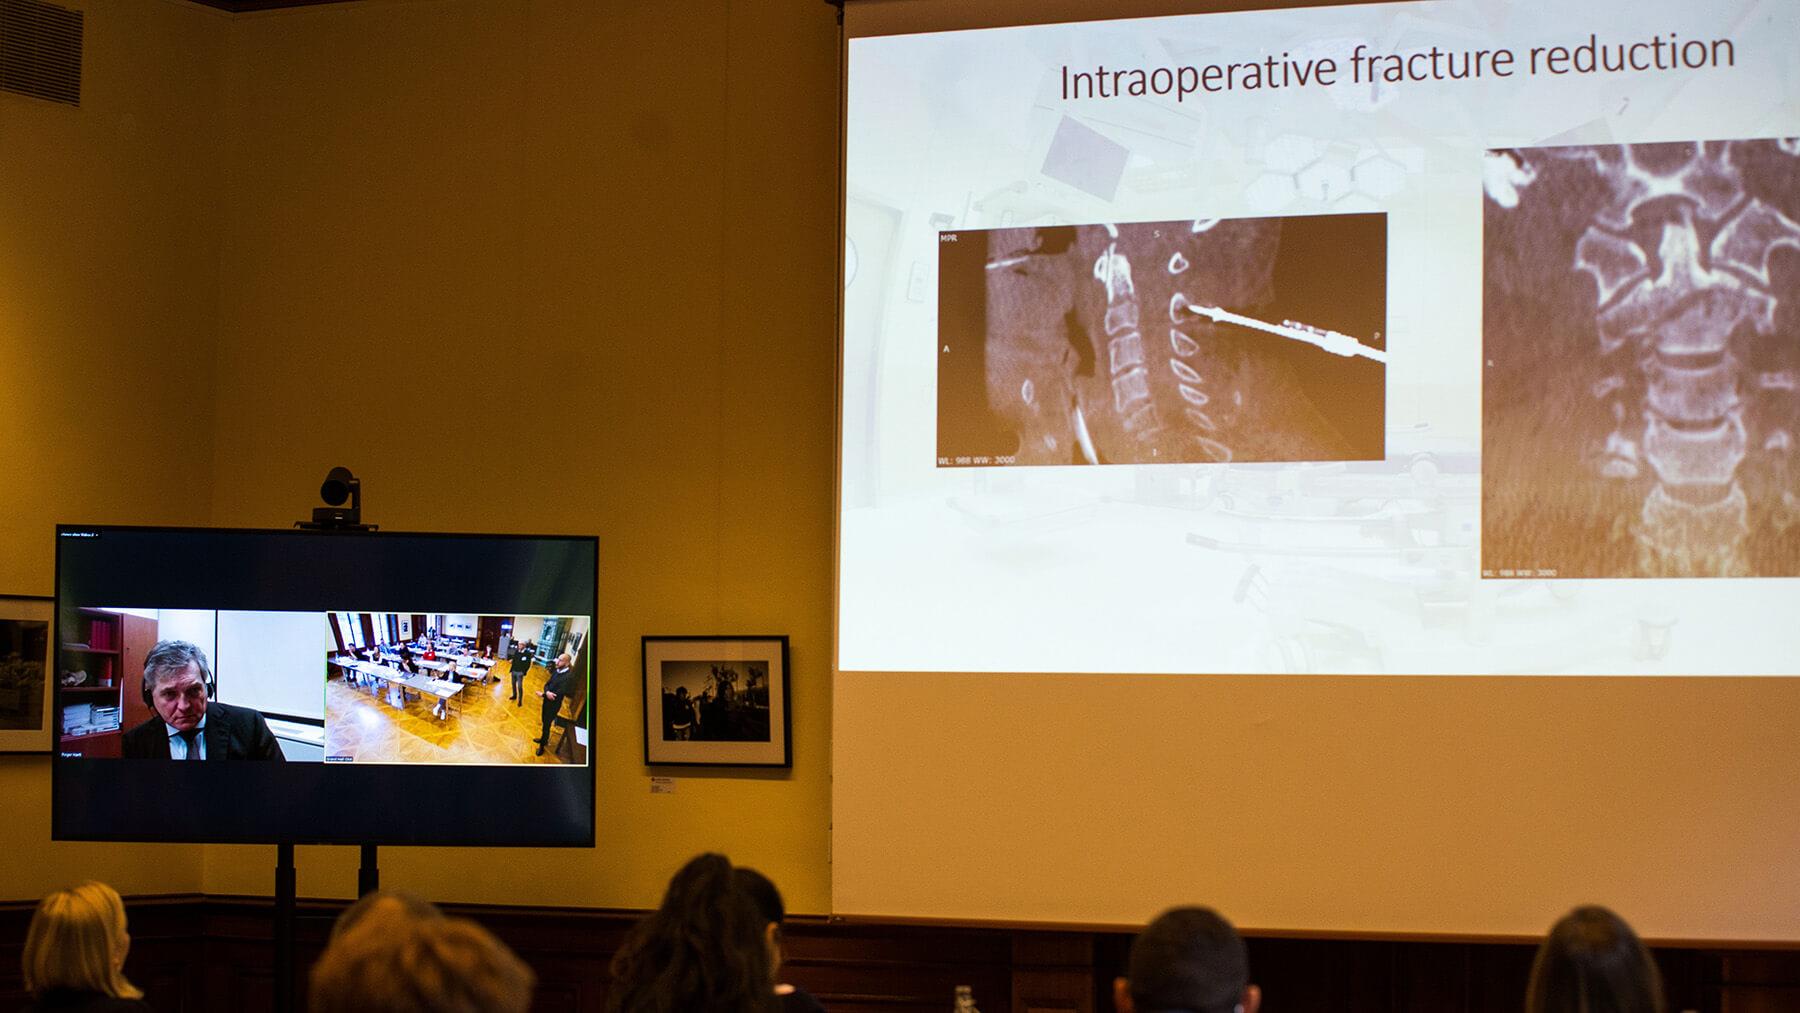 Fellows' Case Presentations with Dr. Haertl